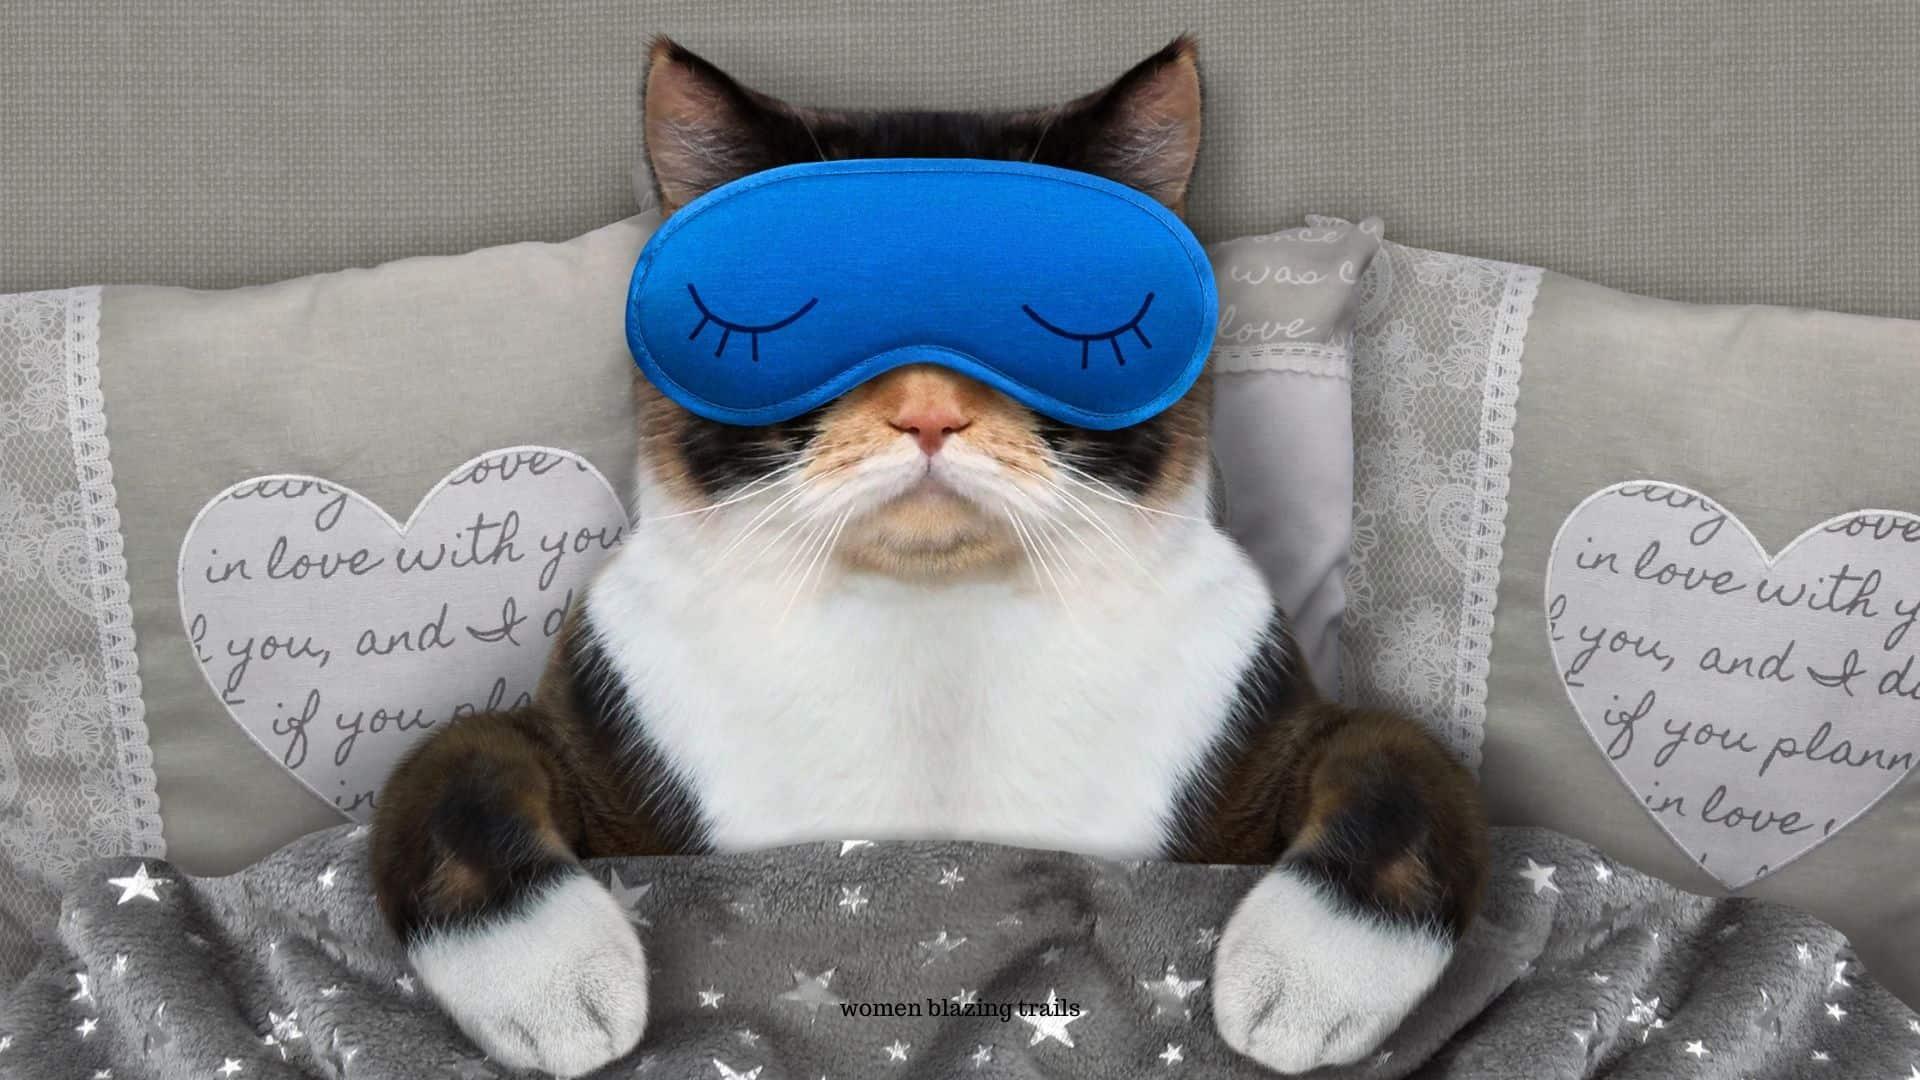 sleeping cat-how to get a good night sleep article